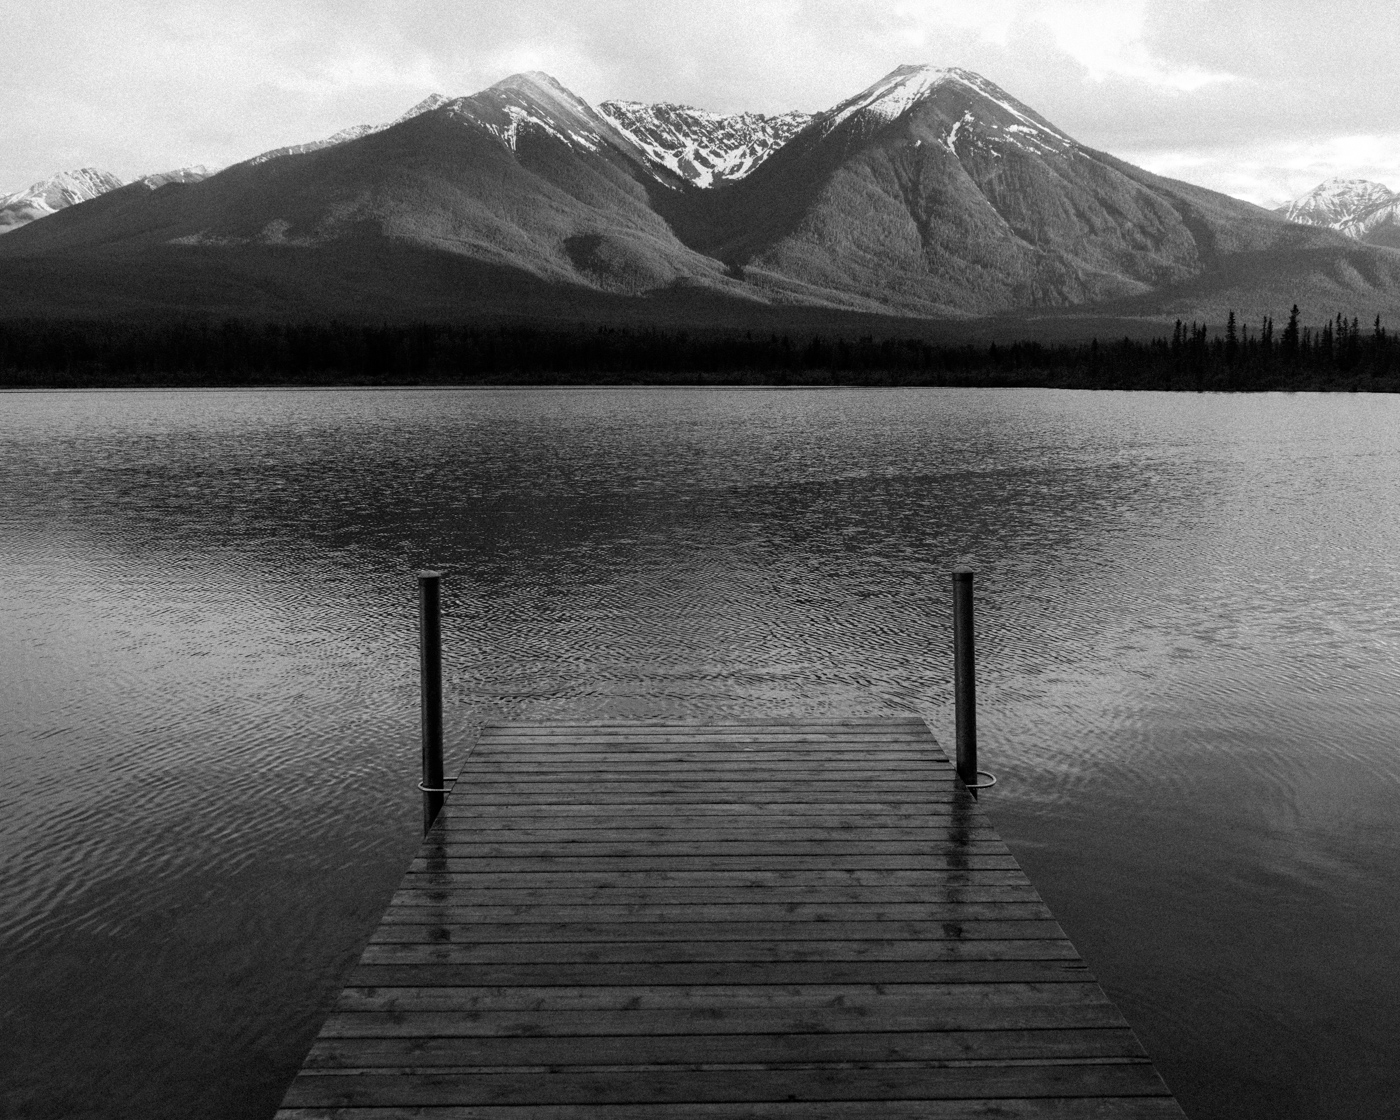 Vermillion Lakes, Banff National Park, Alberta, May 2016